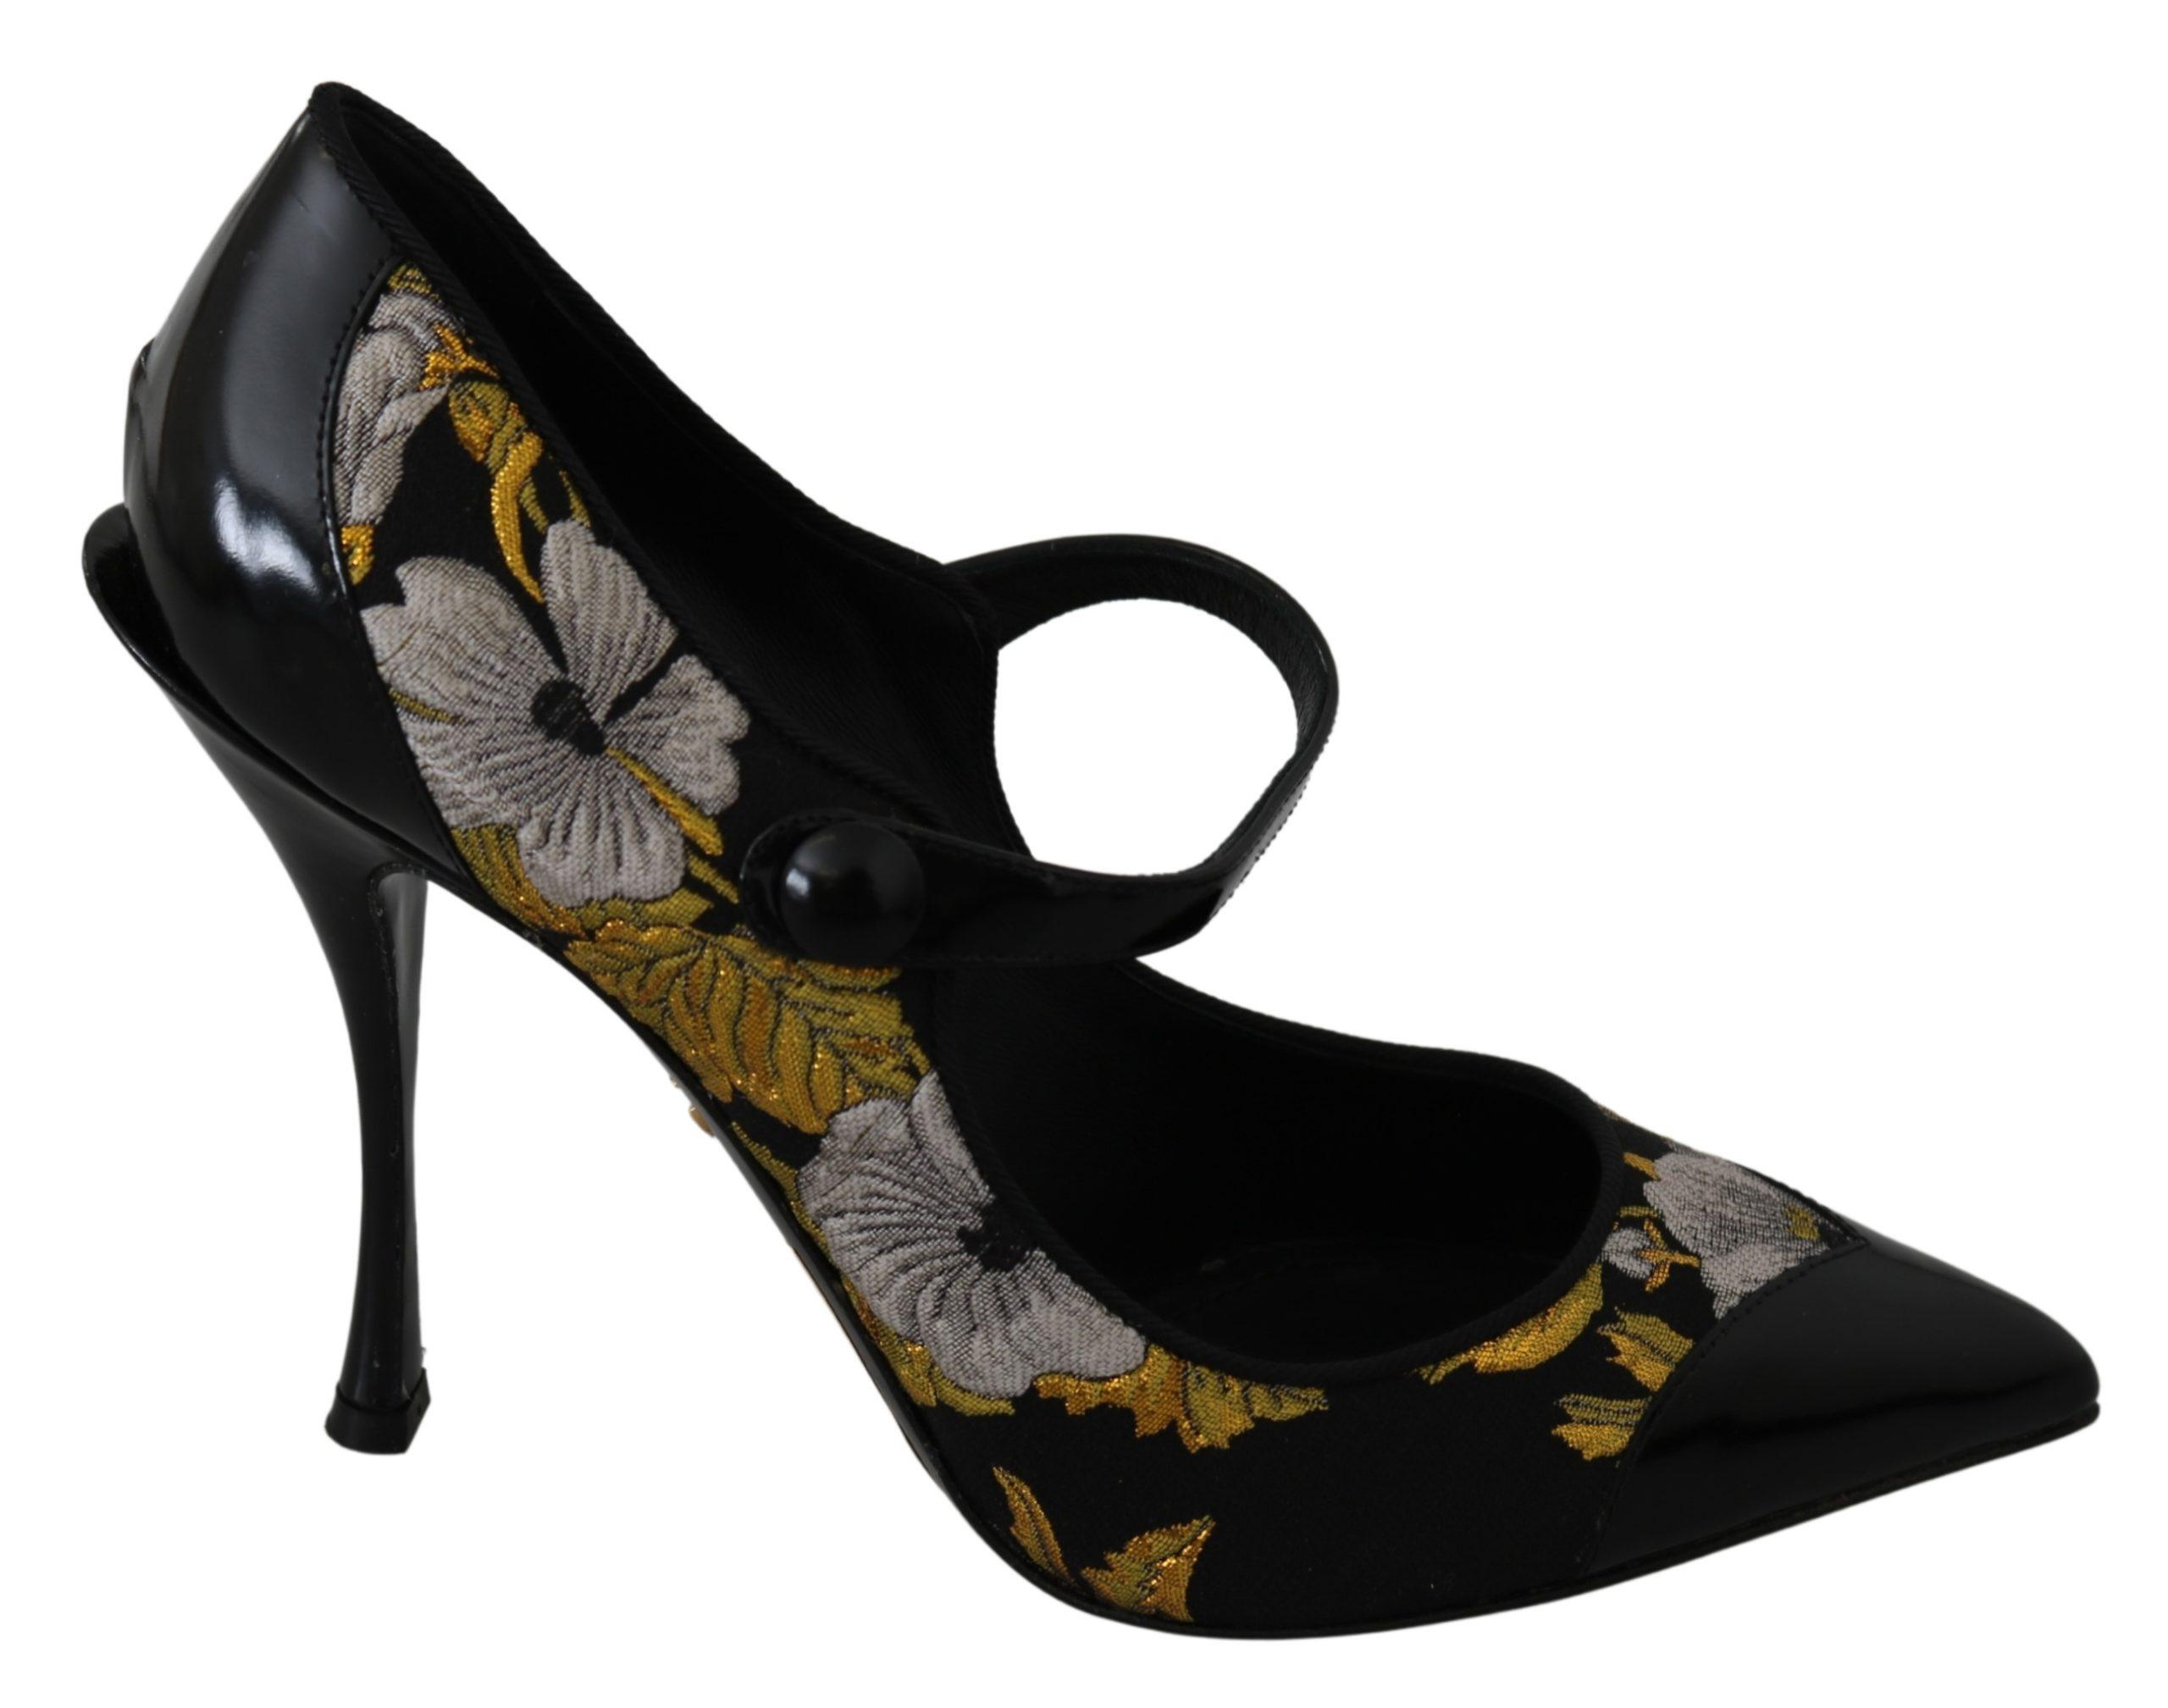 Dolce & Gabbana Women's Mary Janes Leather Pumps Black LA7254 - EU39/US8.5